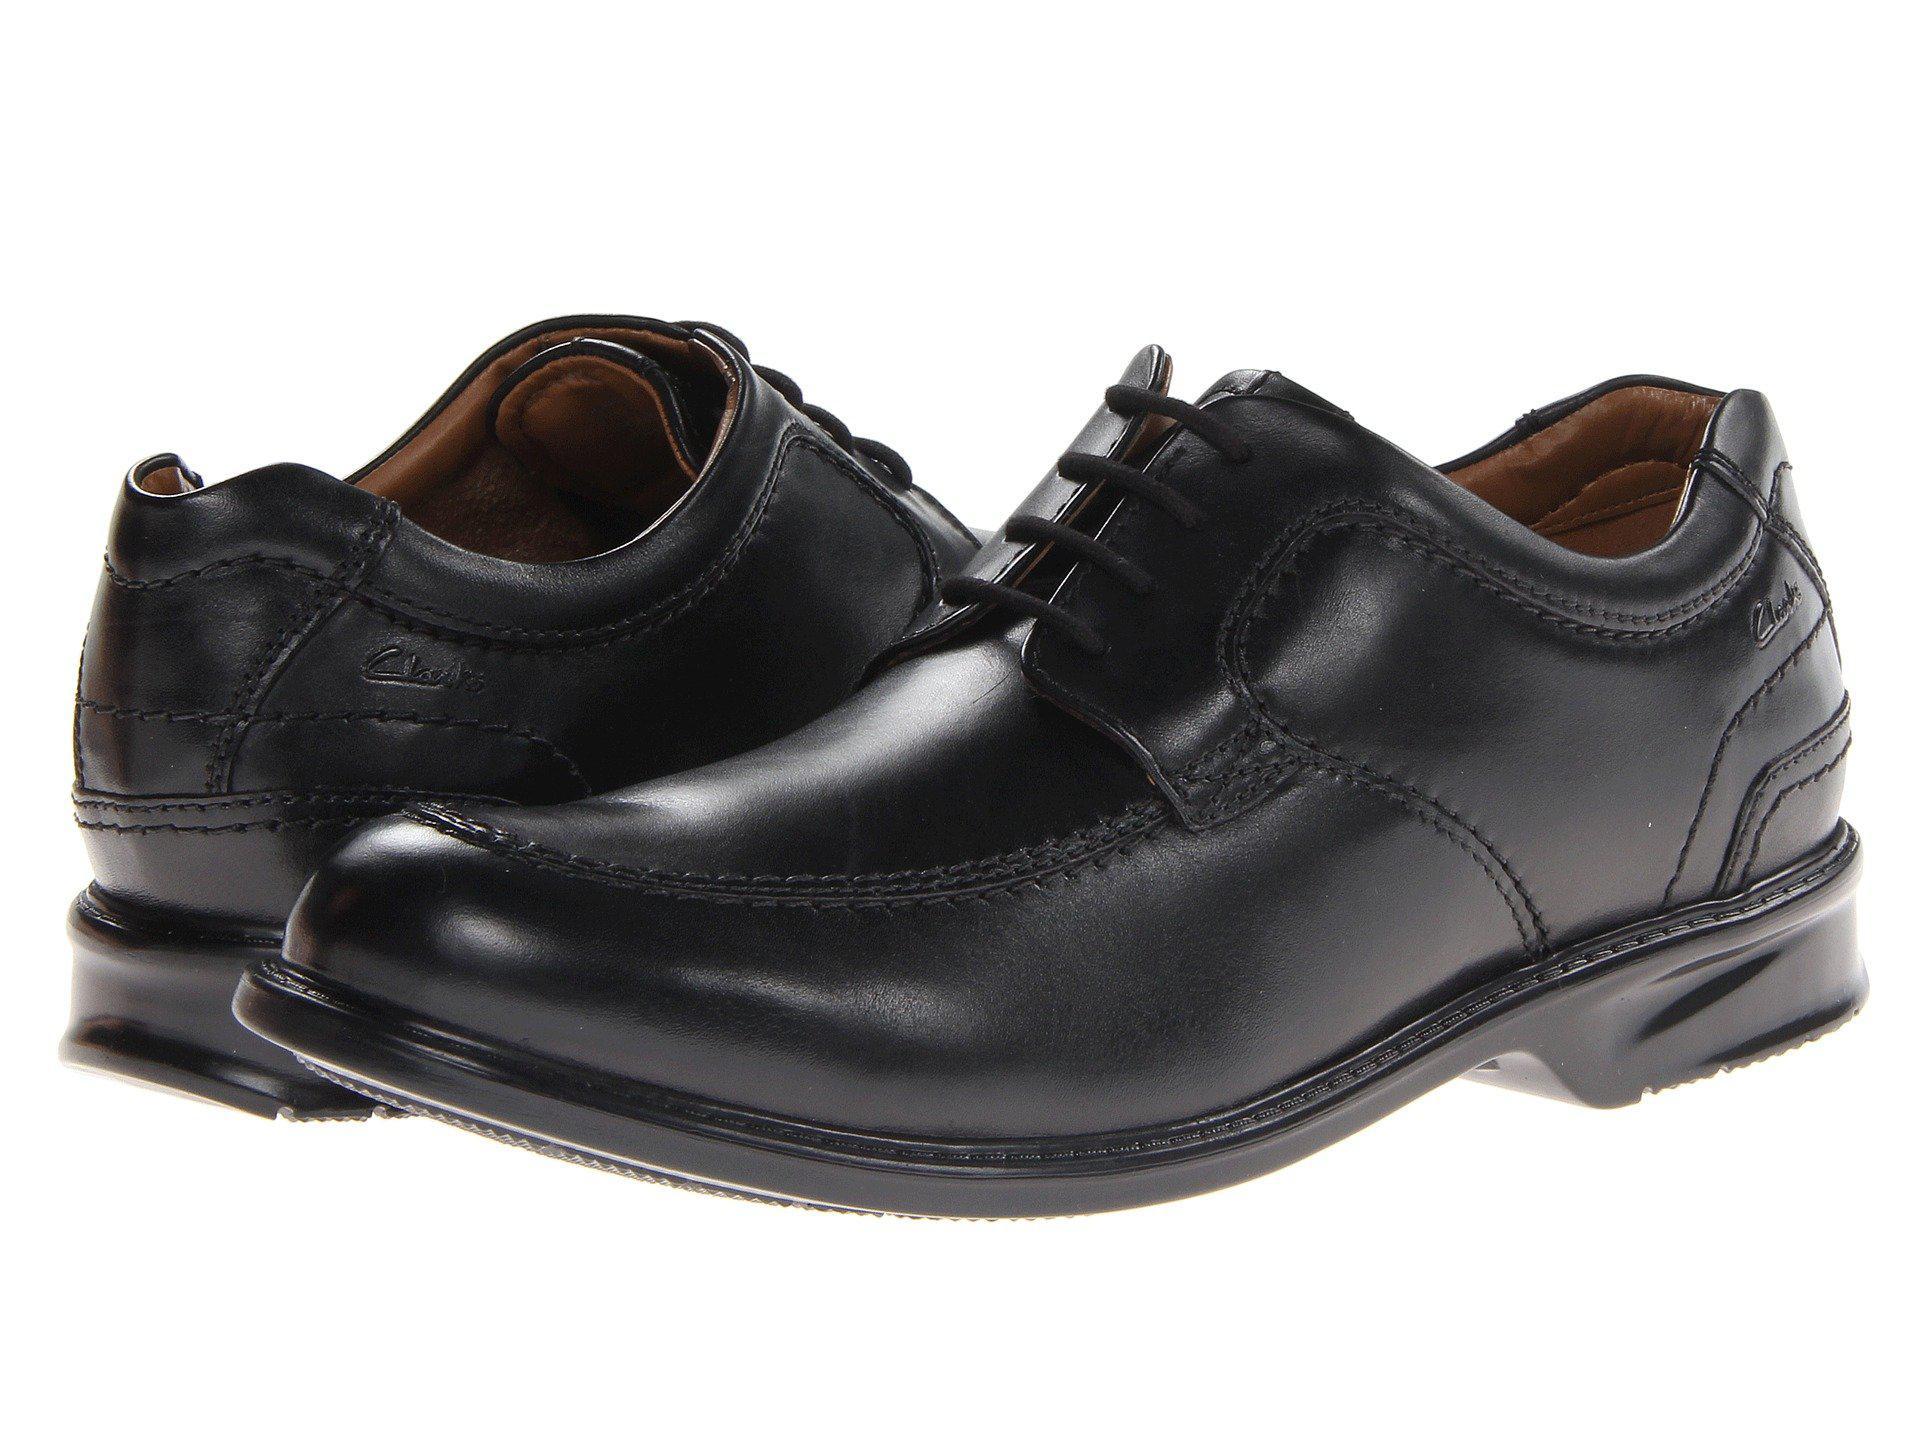 ddc186727e34 Lyst - Clarks Colson Camp (black) Men s Shoes in Black for Men